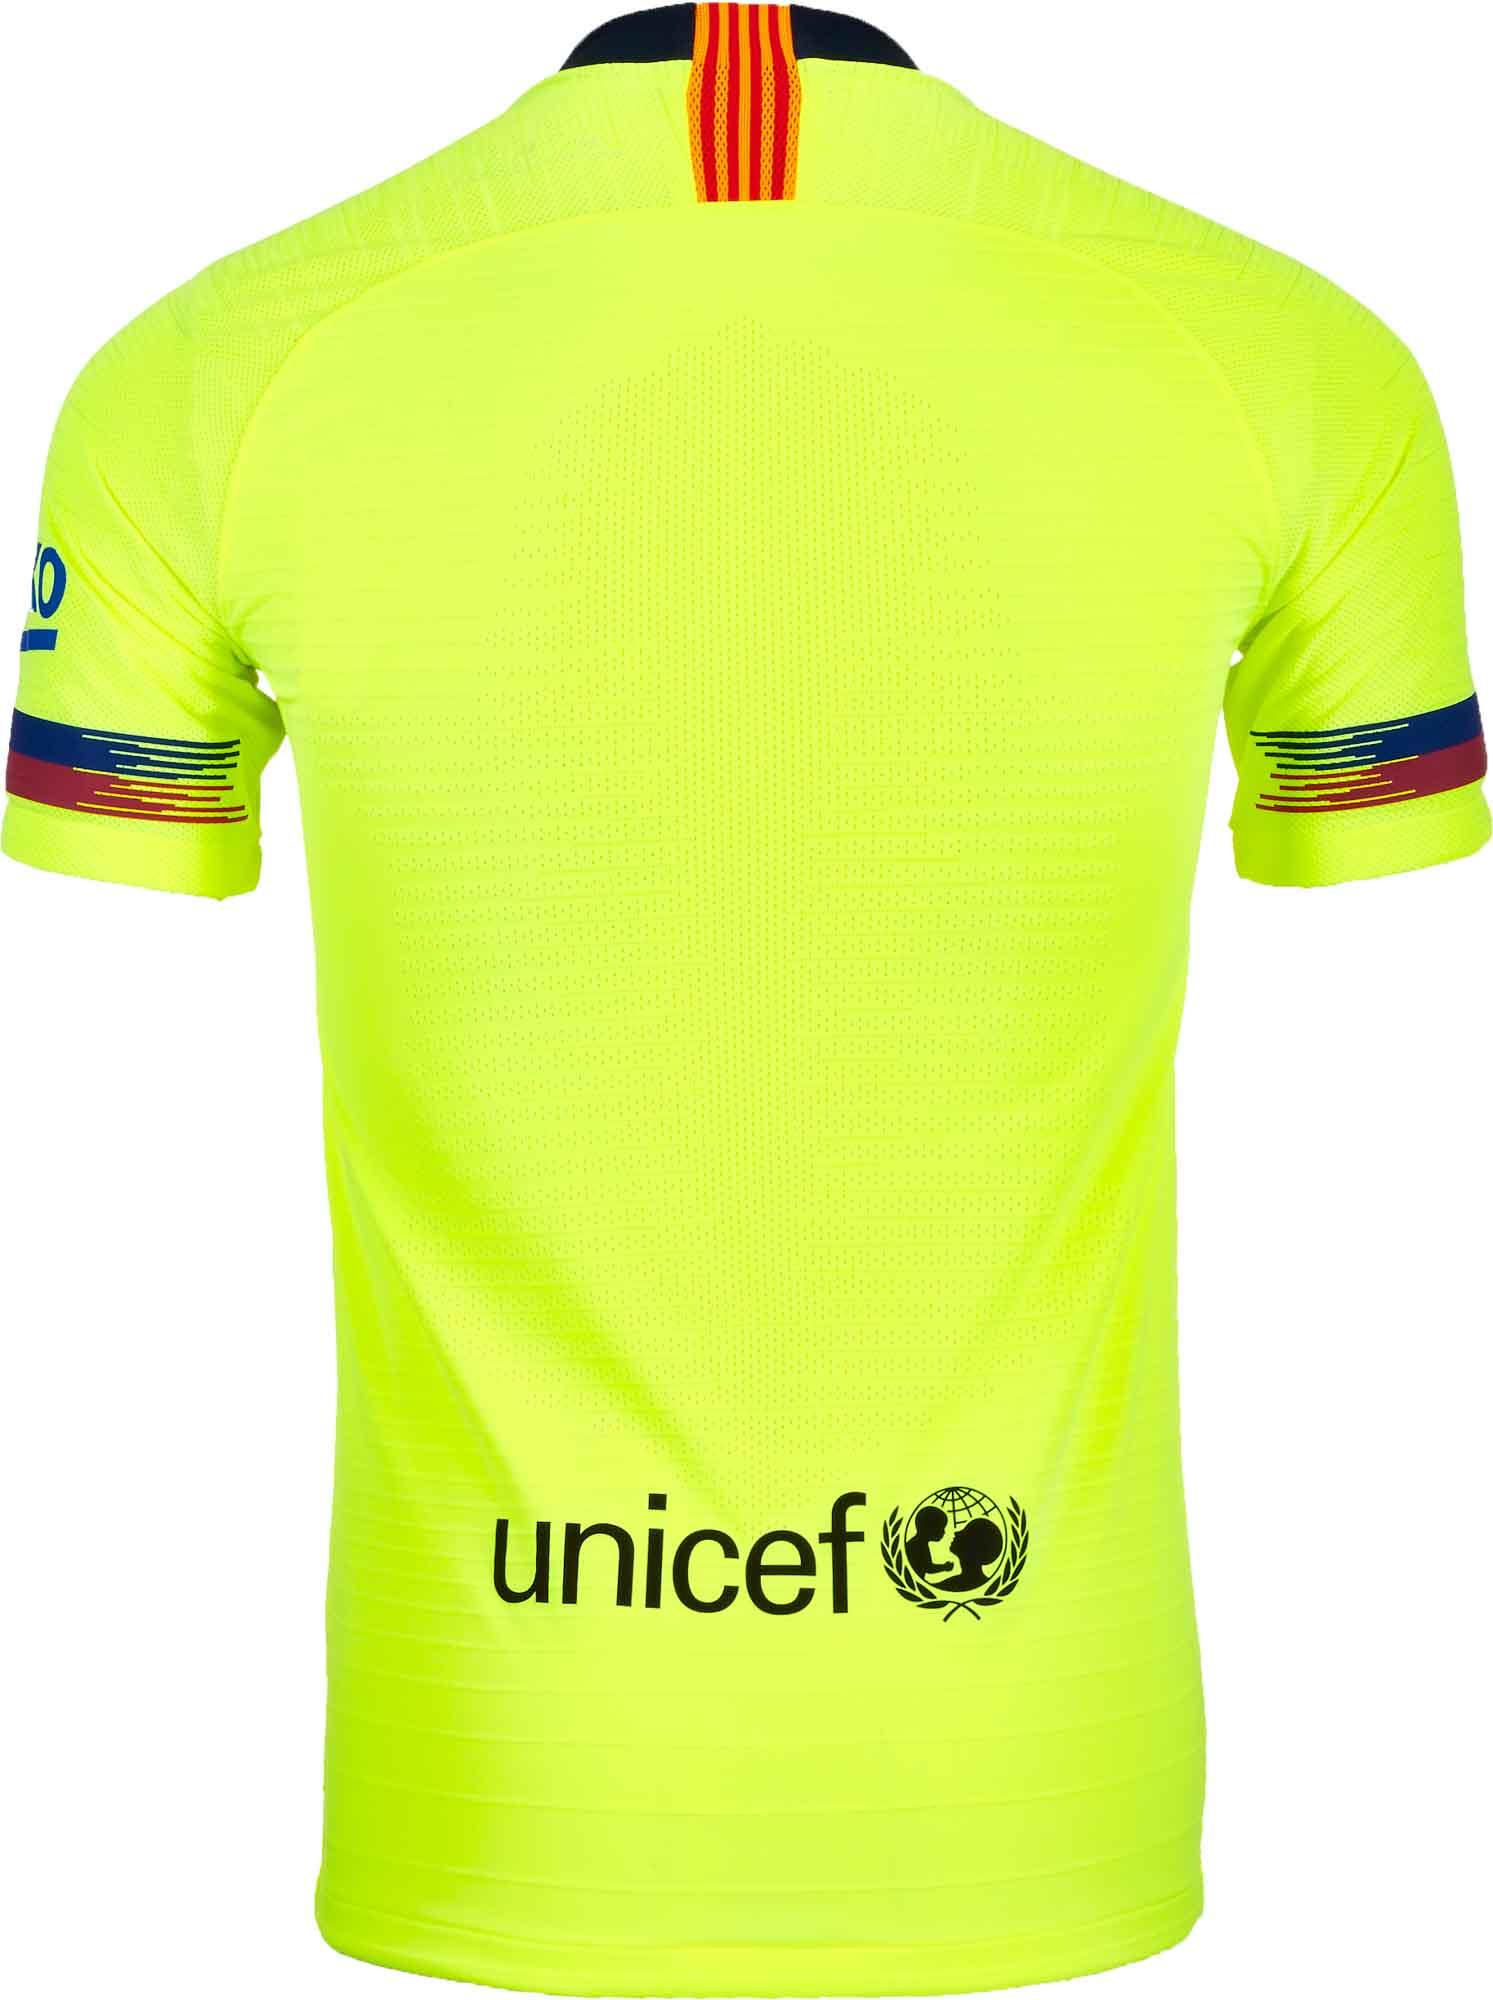 ae292190142 2018/19 Nike Barcelona Away Match Jersey - SoccerPro